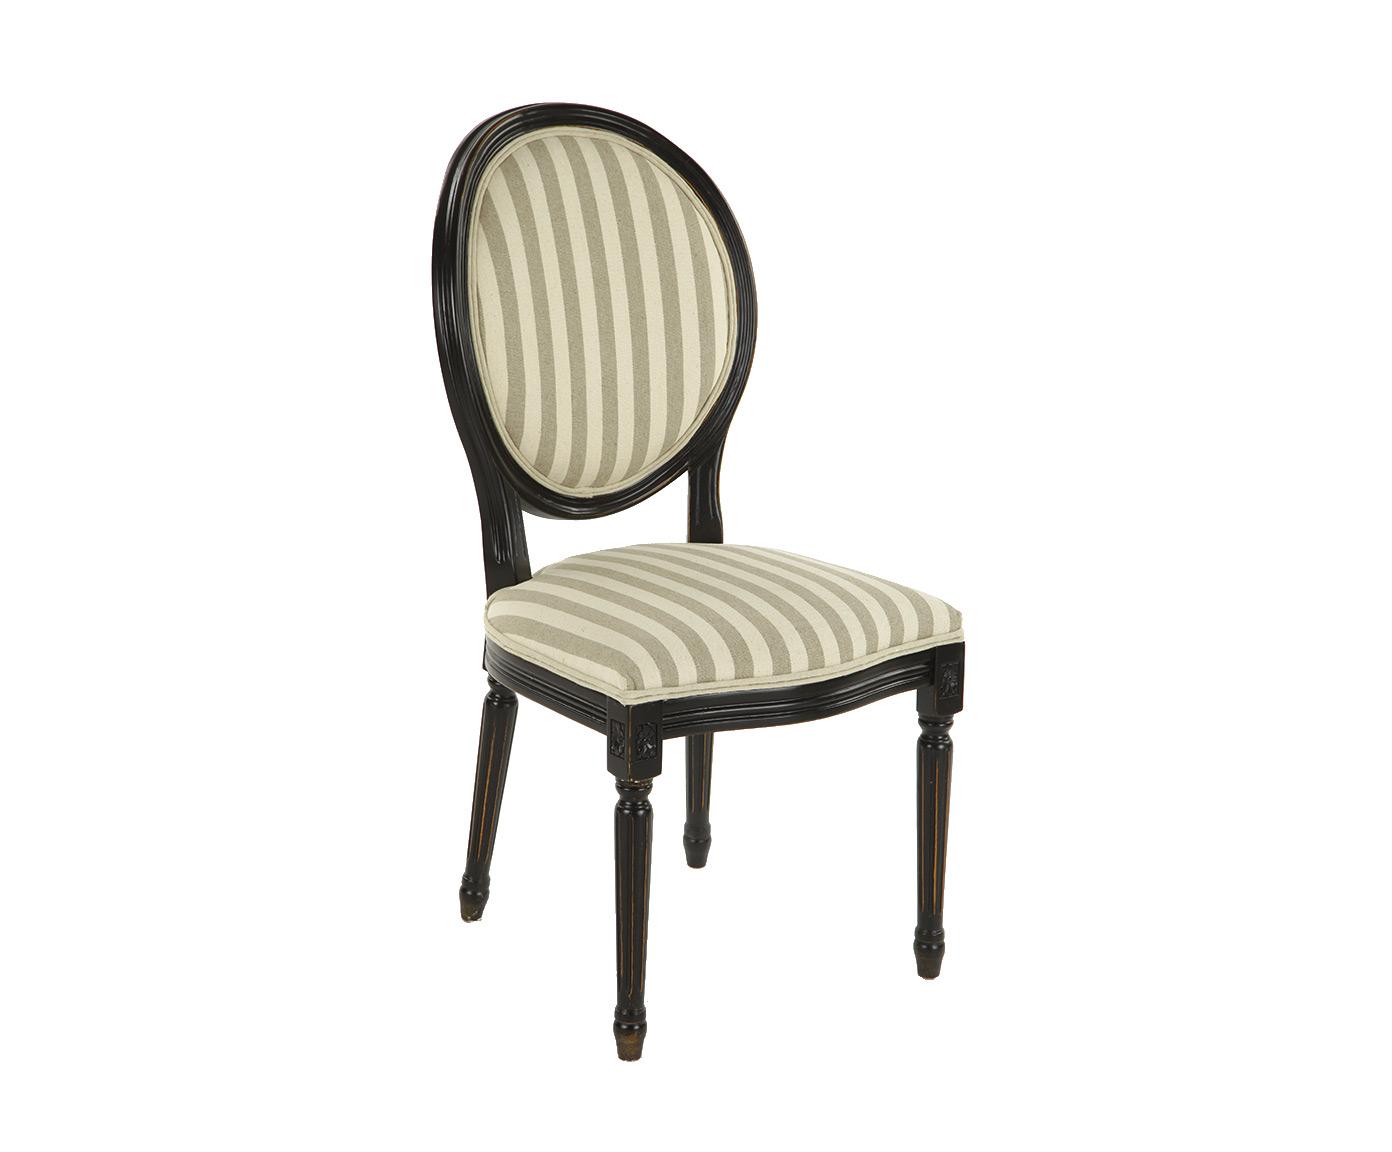 СтулОбеденные стулья<br><br><br>Material: Текстиль<br>Width см: 49<br>Depth см: 49<br>Height см: 97